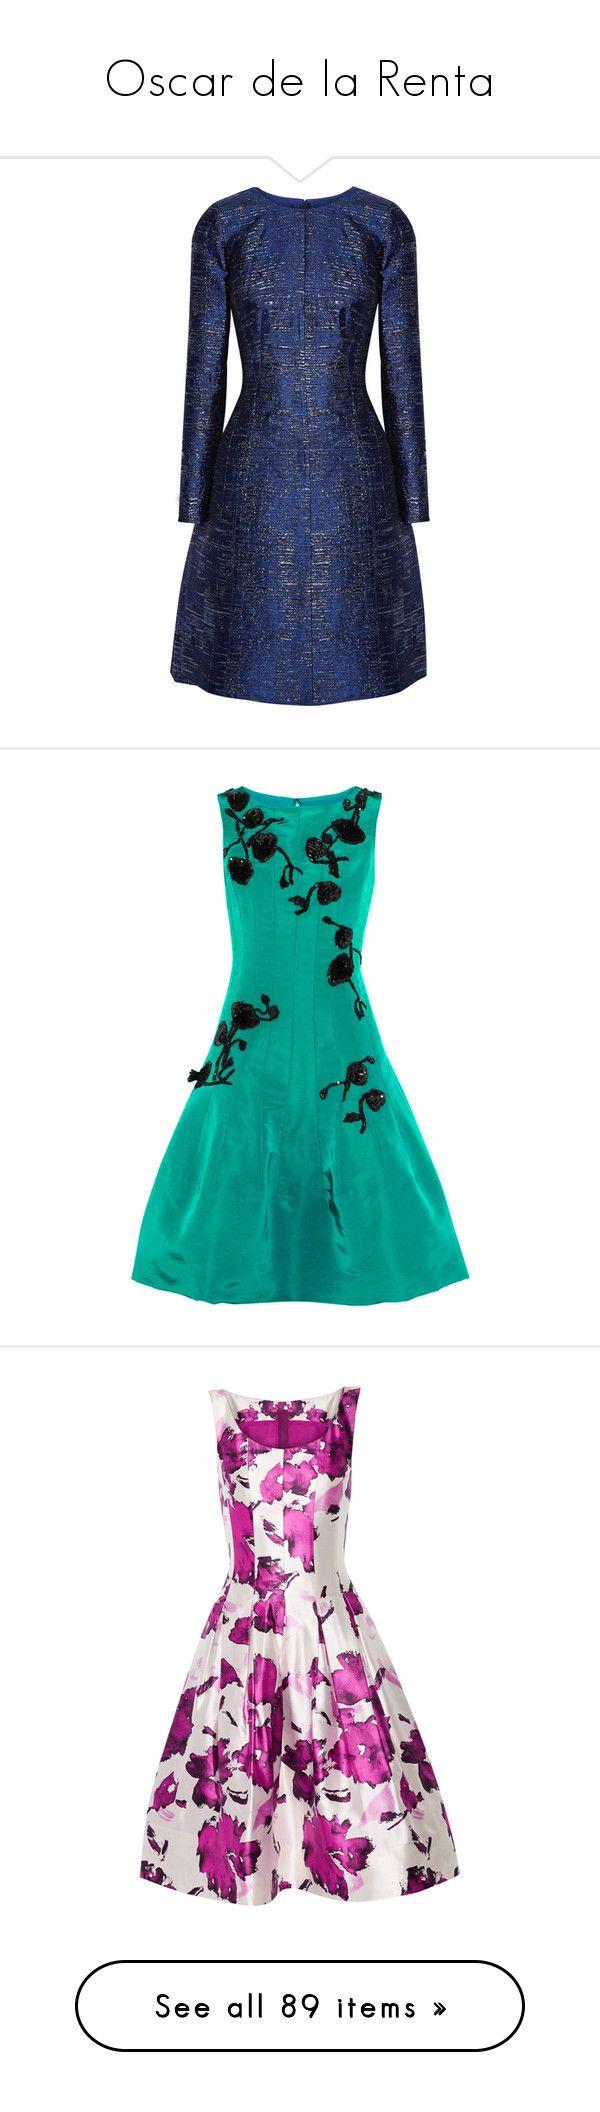 """Oscar de la Renta"" by shoppings9 ❤ liked on Polyvore featuring dresses, short dresses, vestidos, robes, metallic cocktail dress, metallic mini dress, blue cocktail dresses, short blue cocktail dresses, blue fit and flare dress and oscar de la renta"